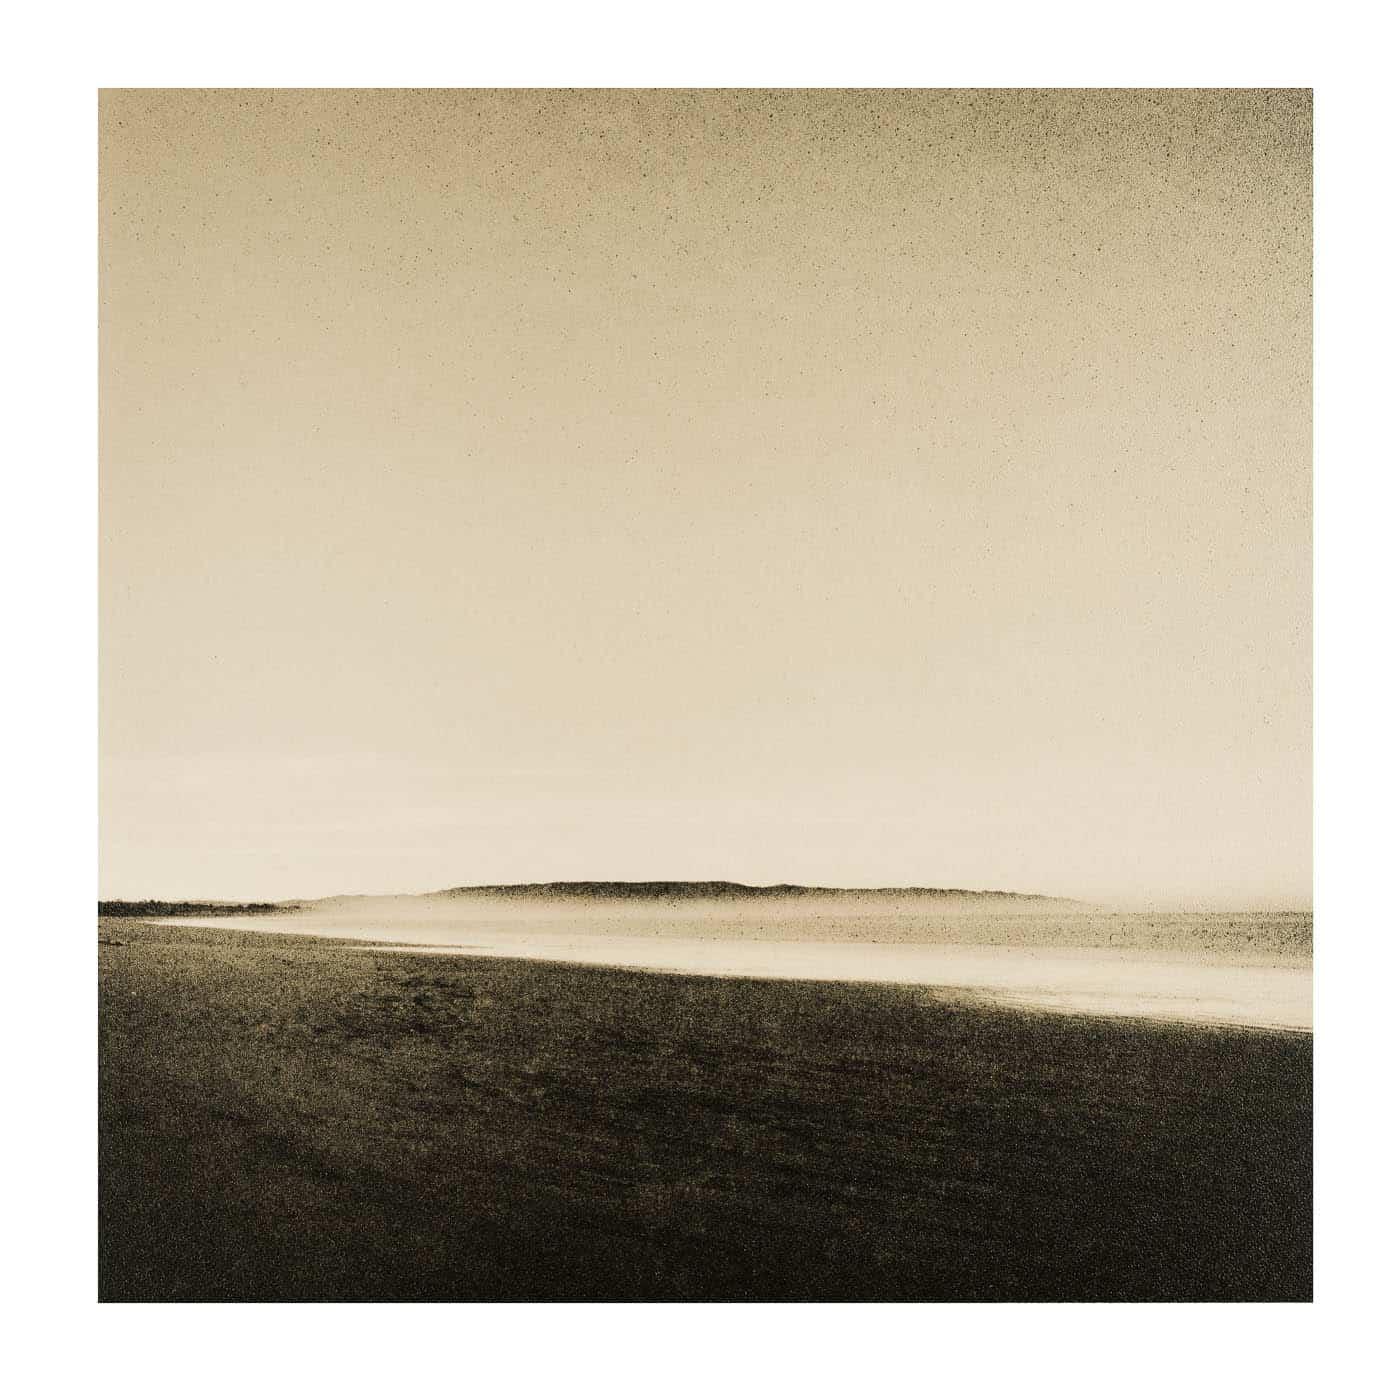 landscape lith print of Pismo Beach California